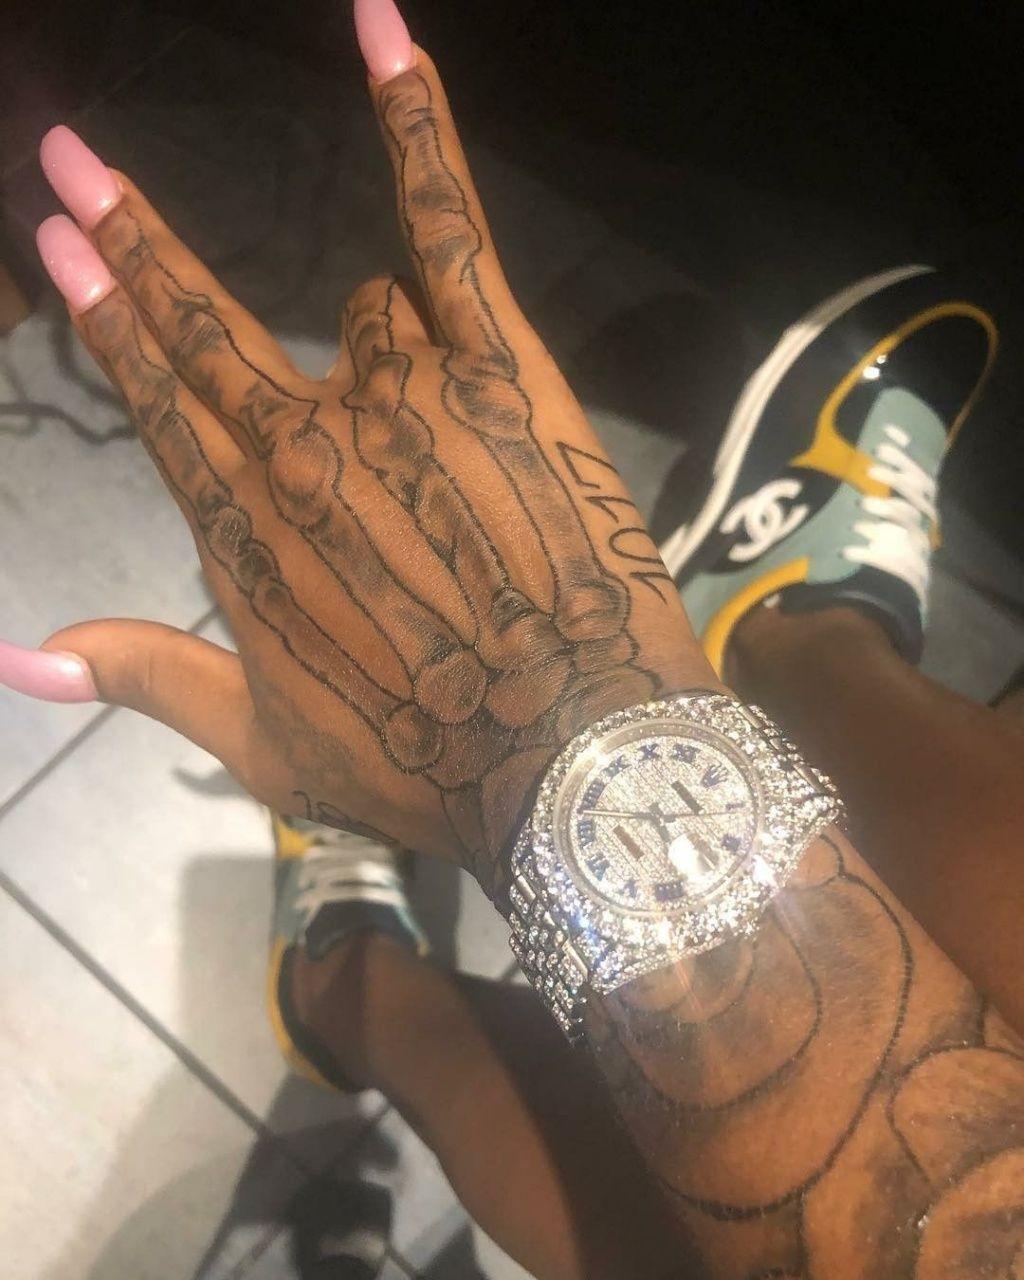 Round Tattoos On Hand In 2020 Hand Tattoos Skull Hand Tattoo Hand Tattoos For Women